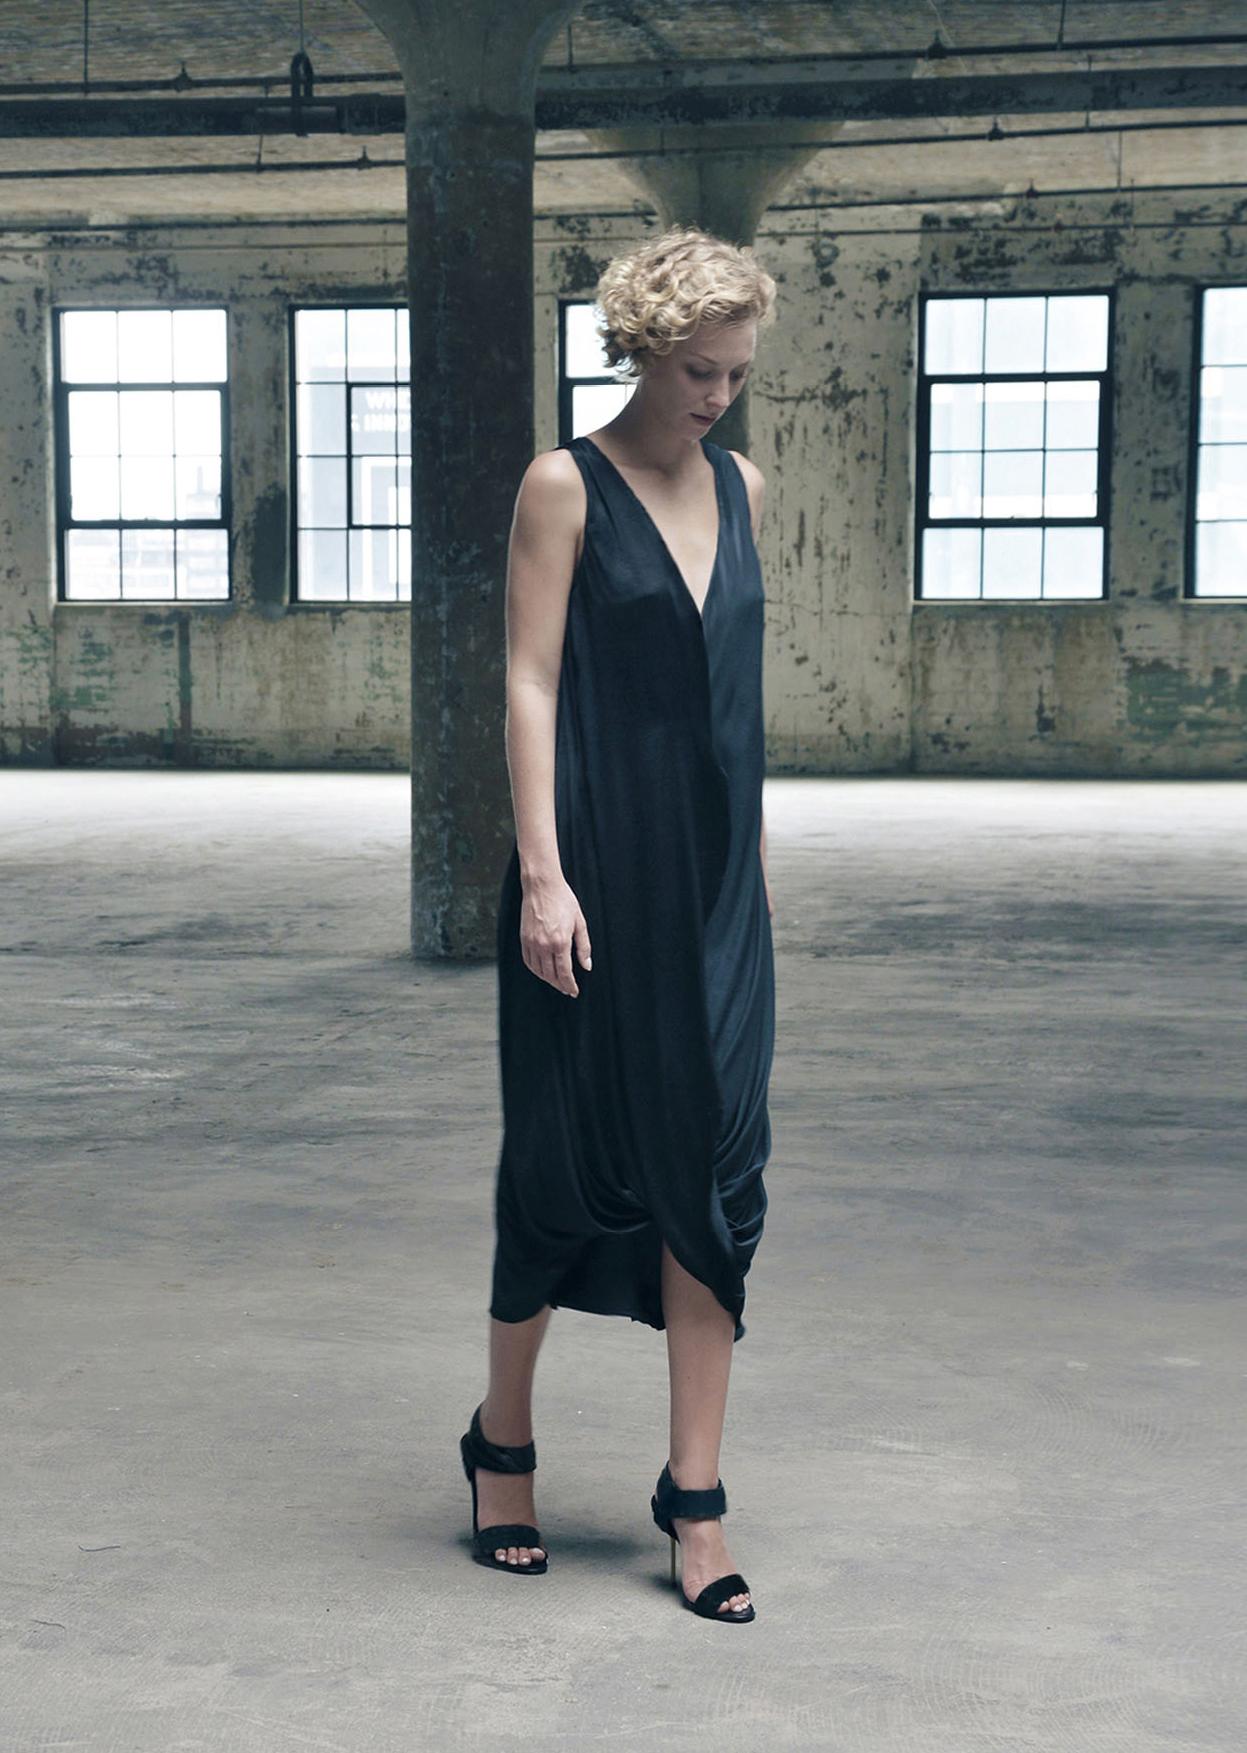 dress4 cropped.jpg